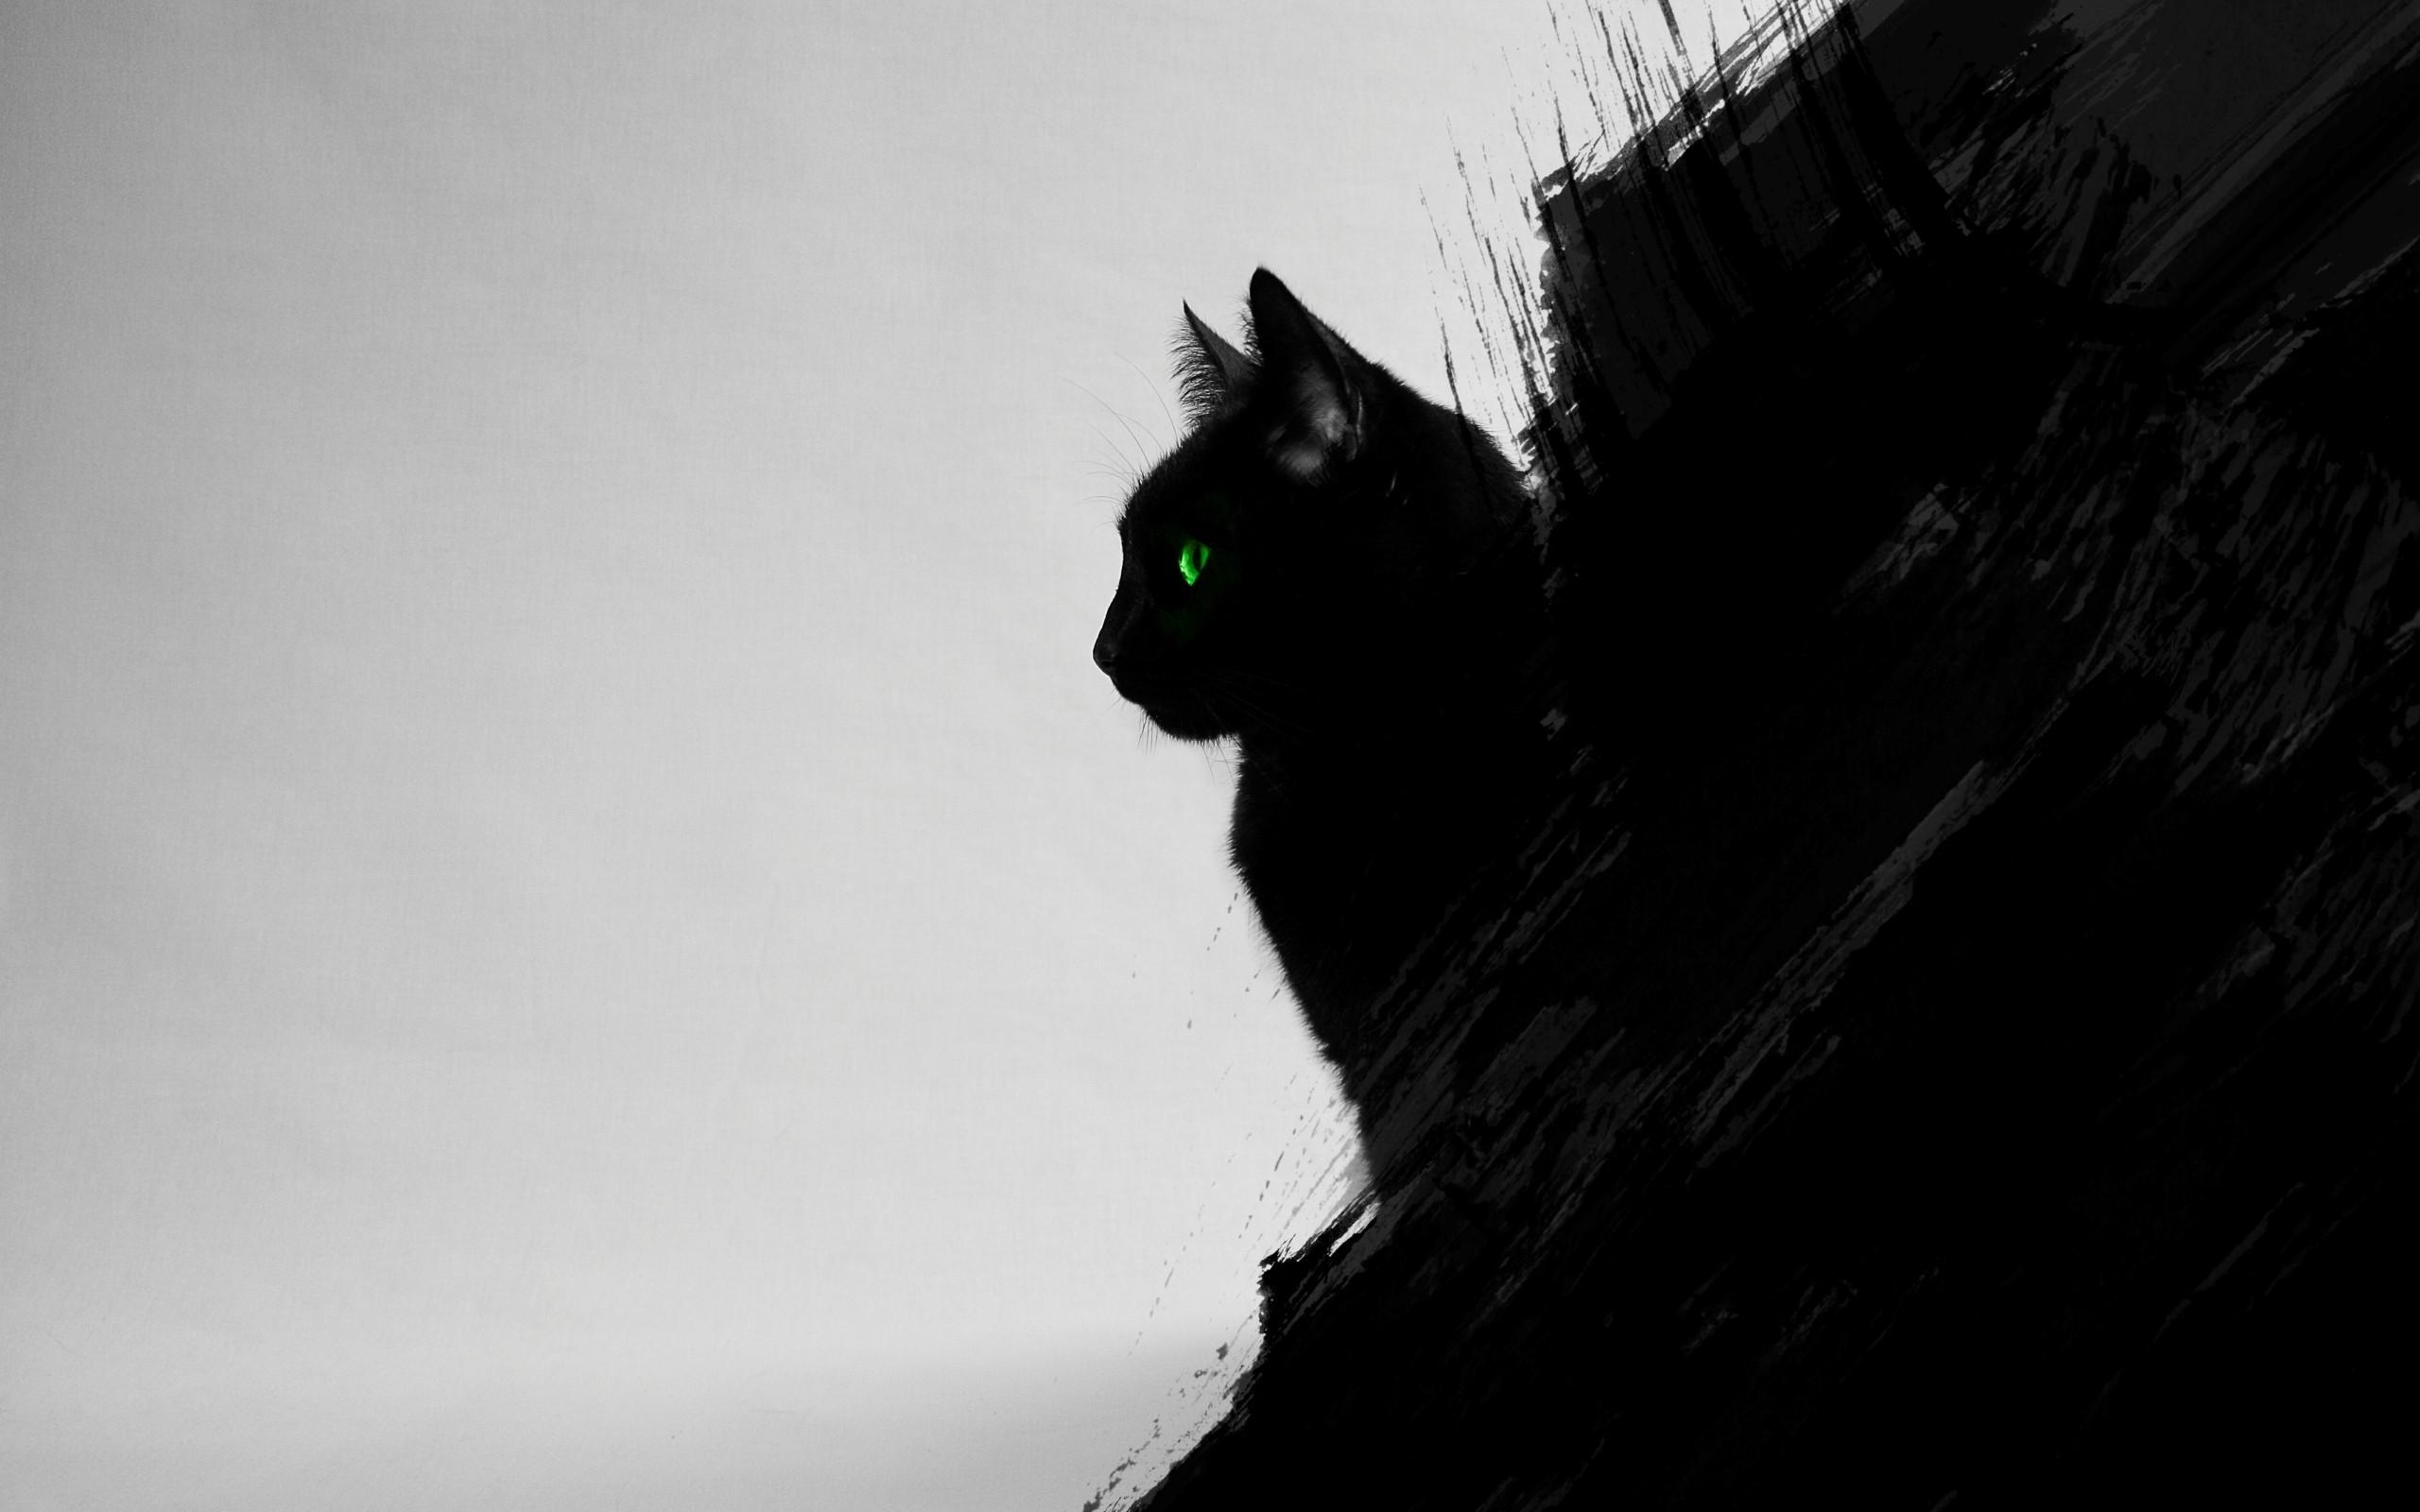 Wallpaper Digital Art Animals Green Eyes Artwork Silhouette